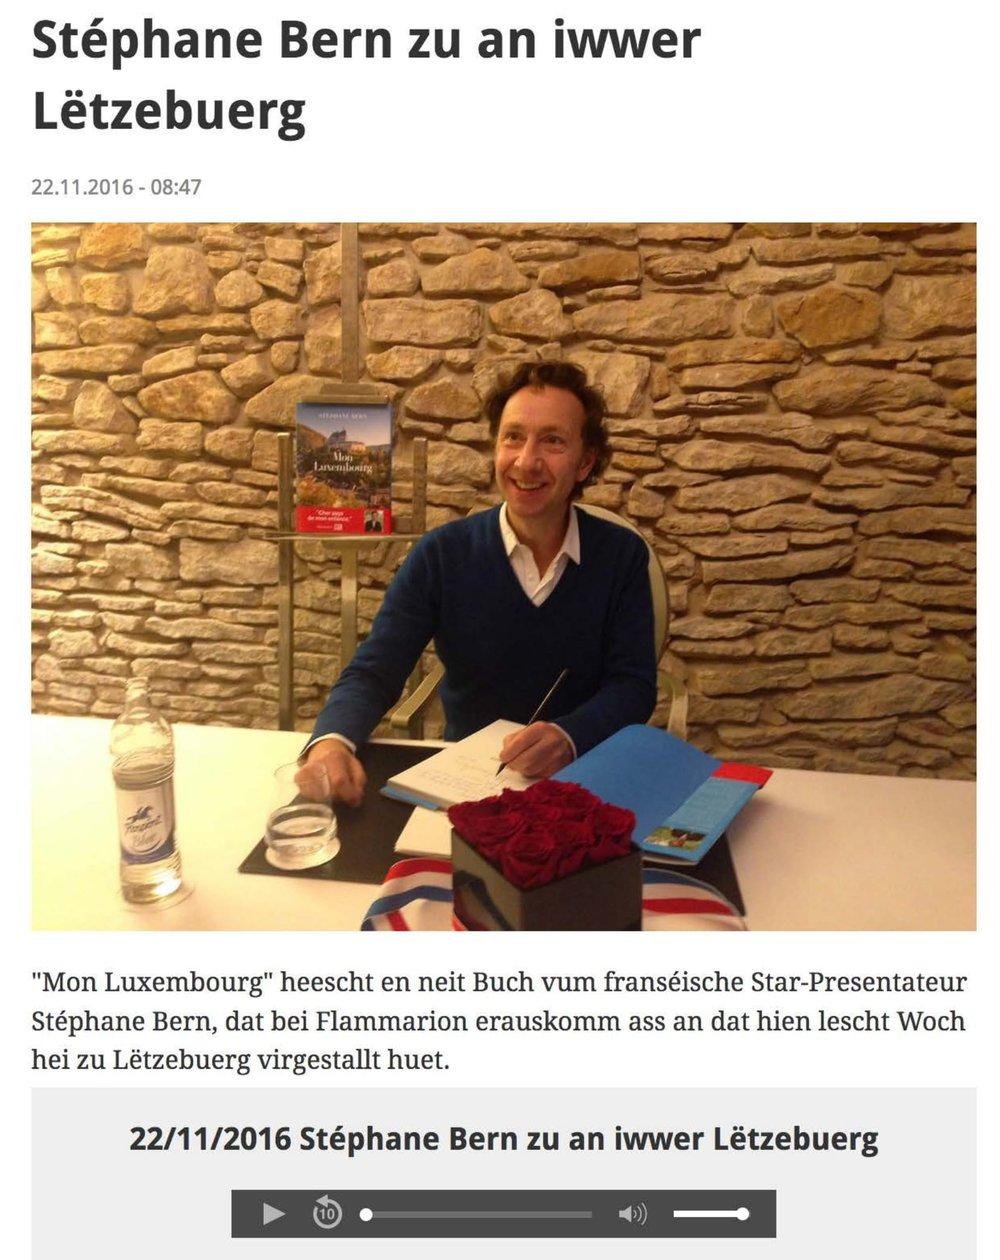 Stéphane Bern copie-1.jpg